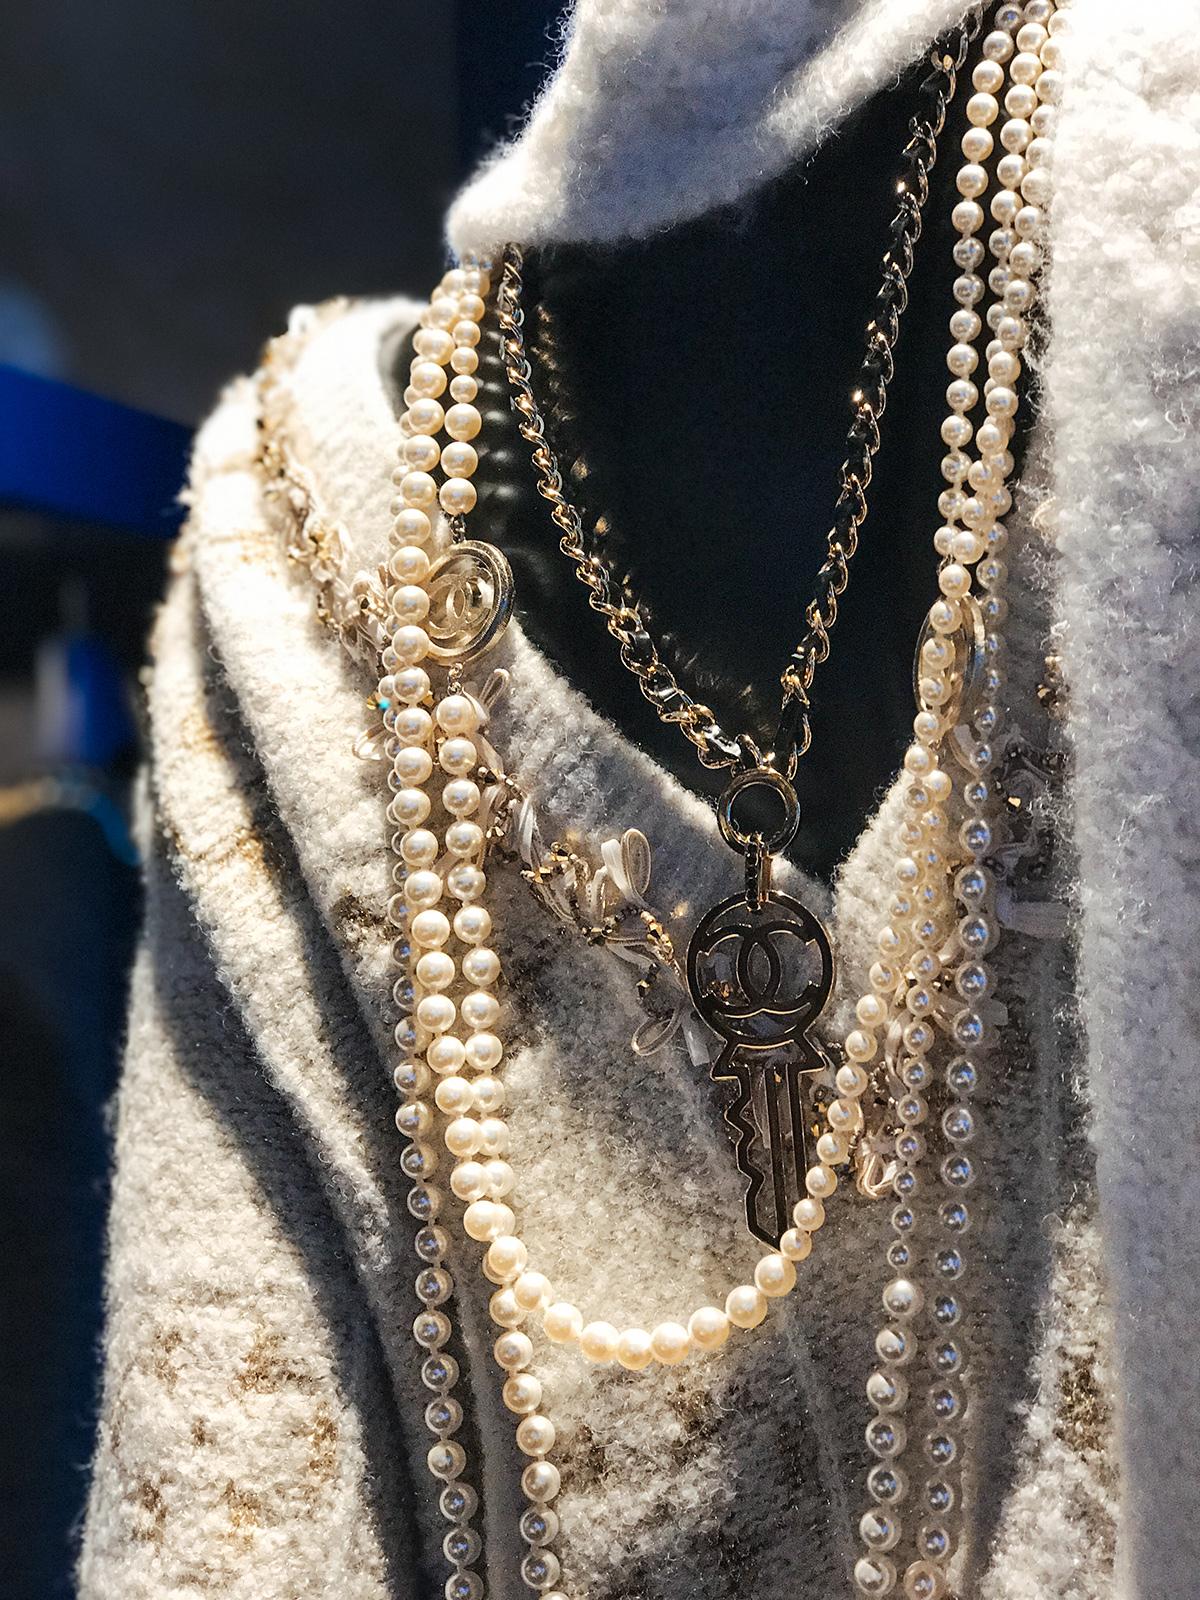 Stylesnooperdan-Chanel-at-Marais-Melbourne-12.jpg